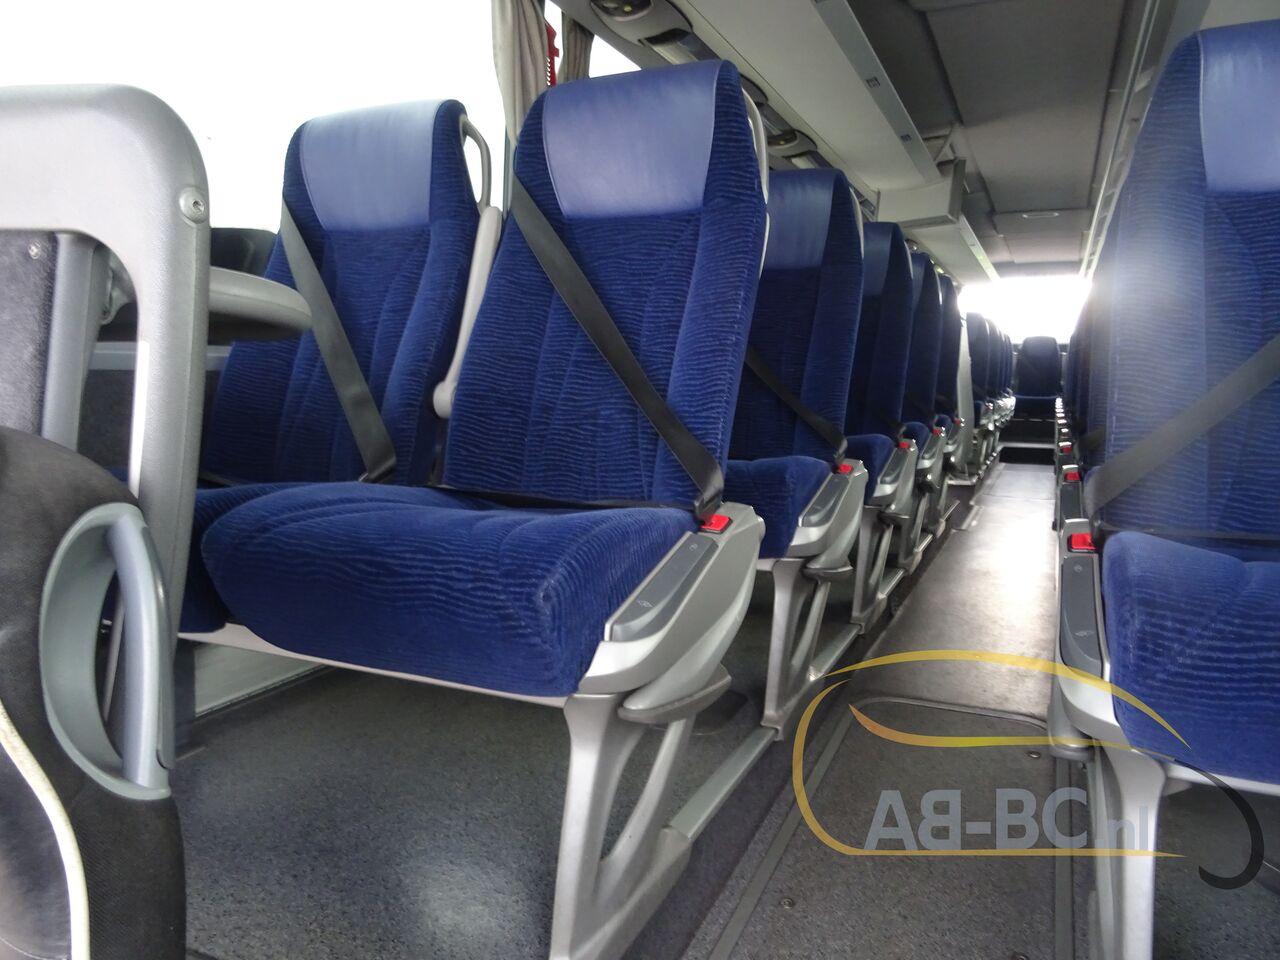 coach-busSETRA-S415-GT-HD-FINAL-EDITION---1627457169567667505_big_93c8b1337e38f348c01cf9697b13d35a--21050713010665719300